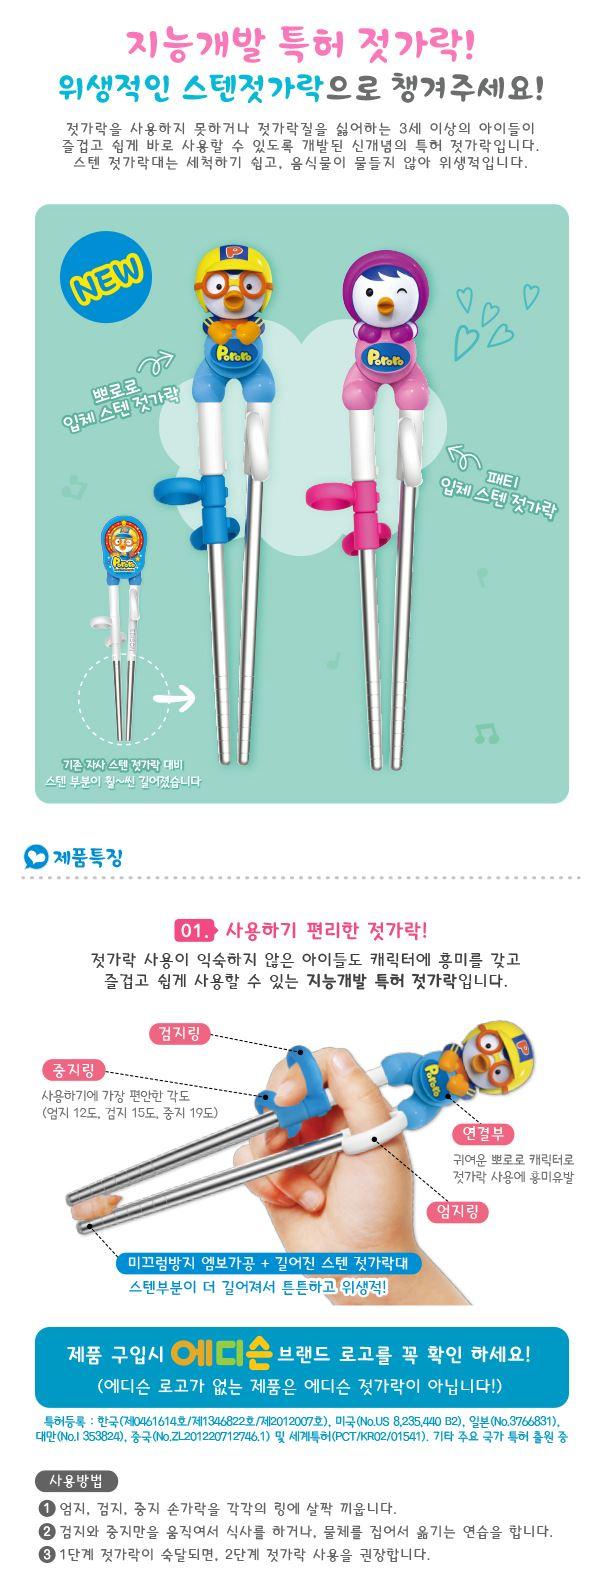 Edison Stainless Chopsticks 1st Step Pororo 1 2 3